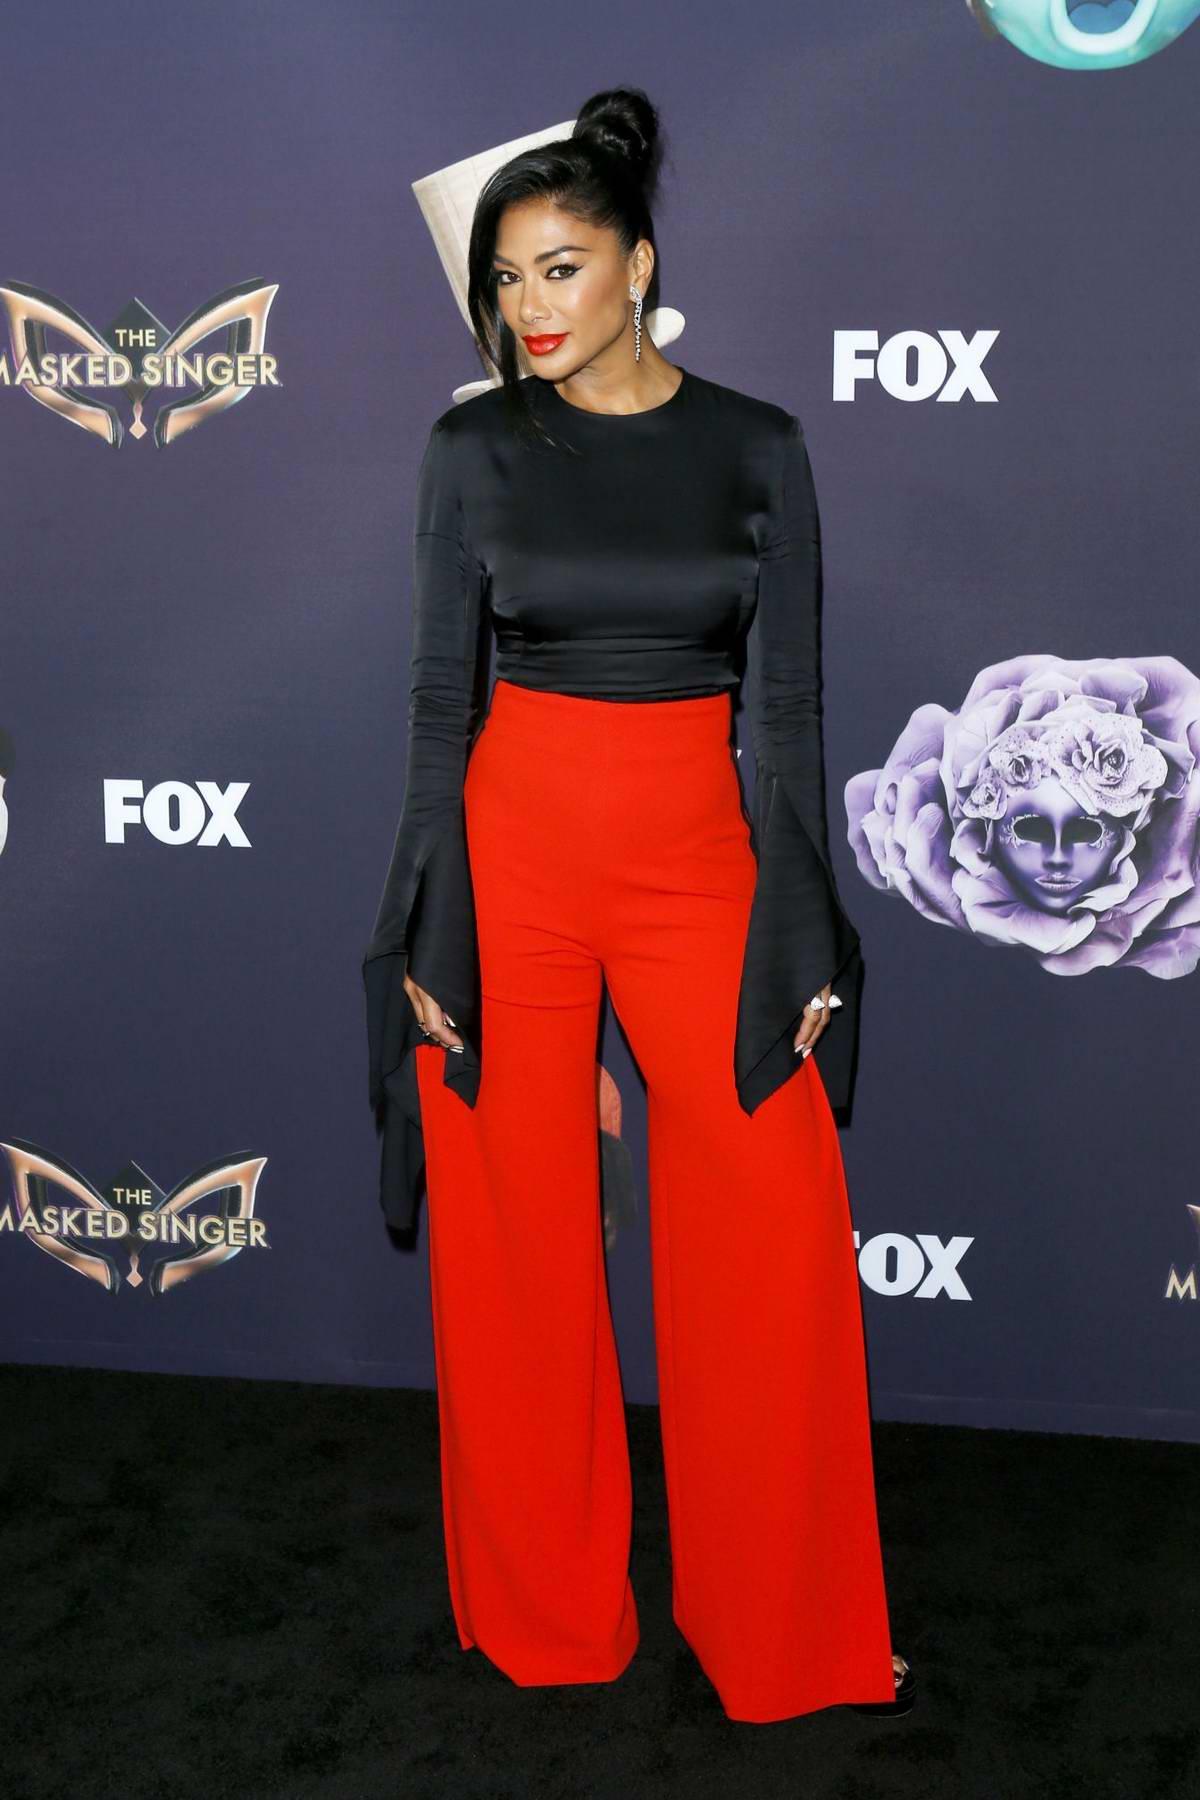 Nicole Scherzinger attends the premiere of Fox's 'The Masked Singer' Season 2 in Los Angeles